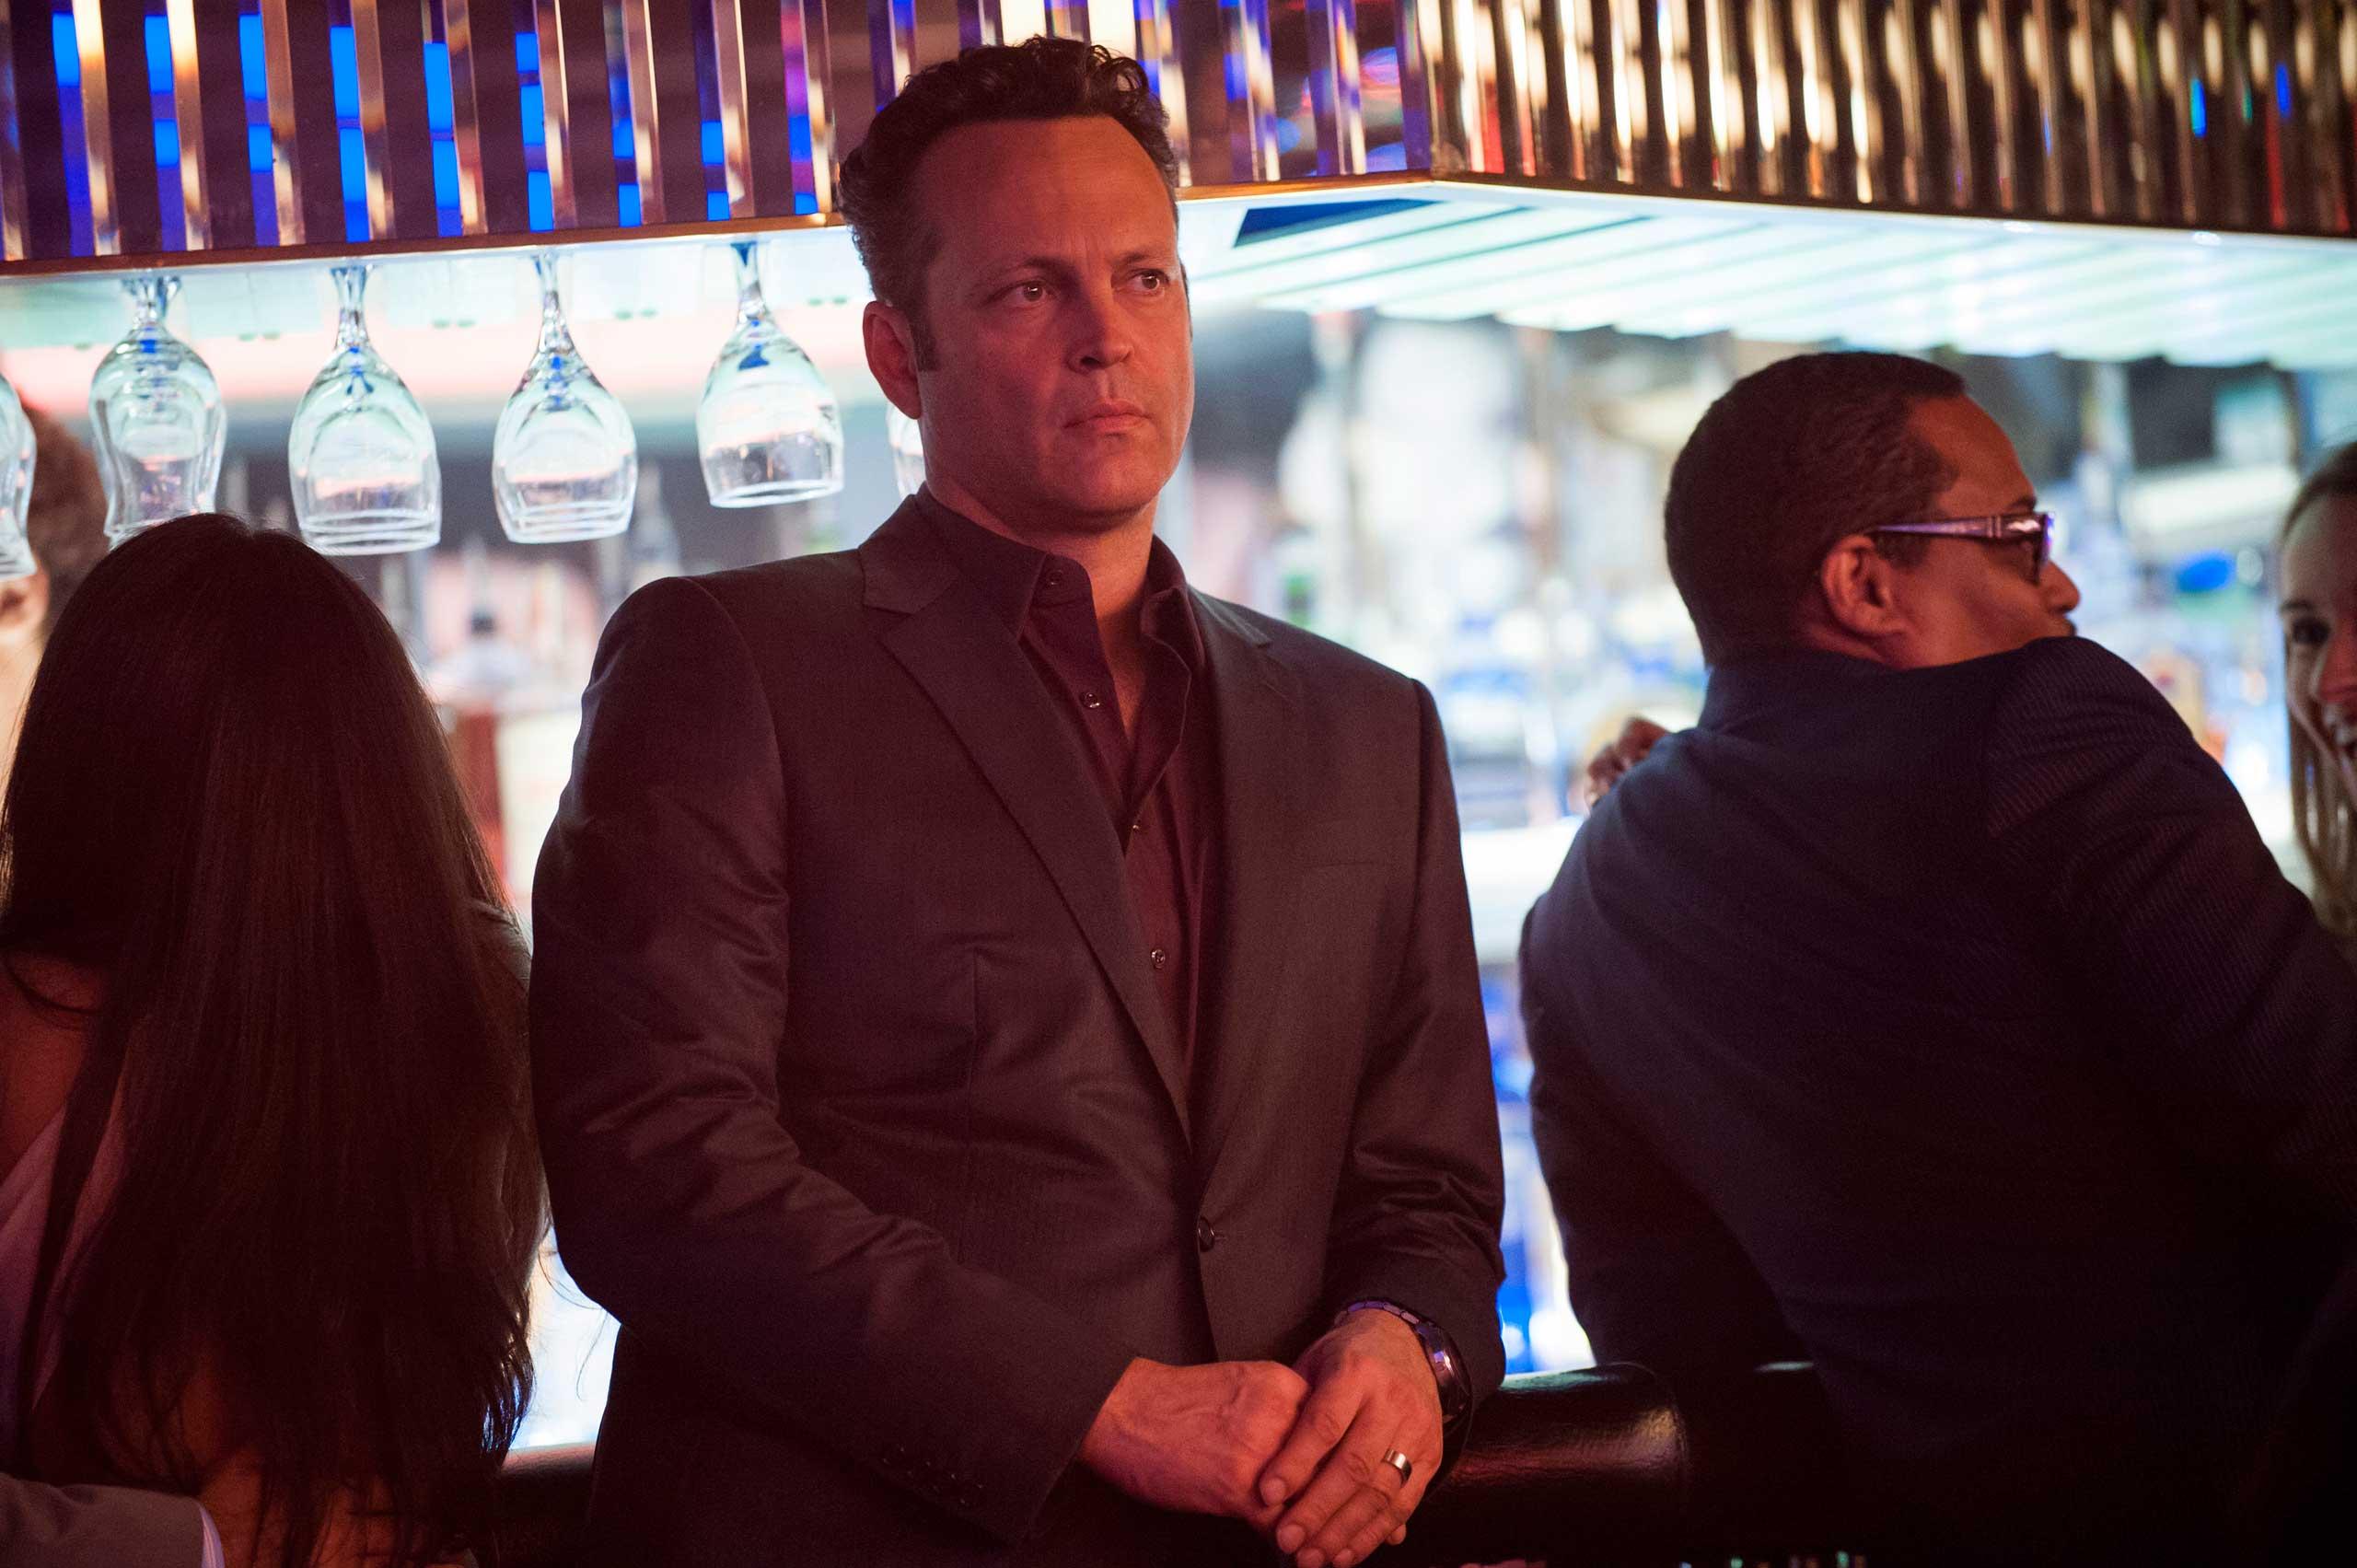 Vince Vaughn in True Detective, Season 2.